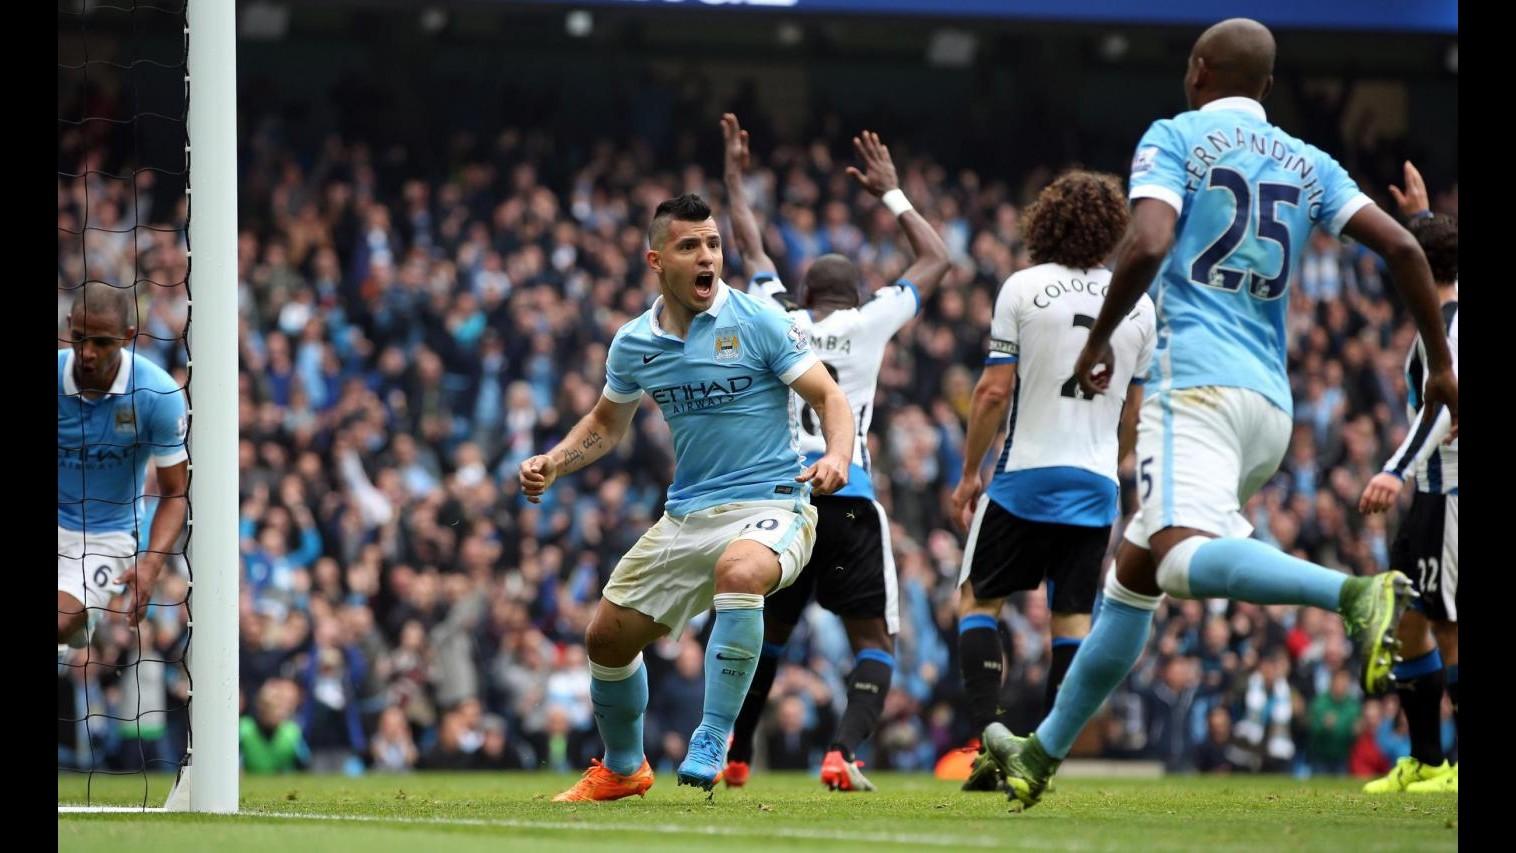 Premier League: Manchester City travolge Newcastle, super Aguero segna 5 reti